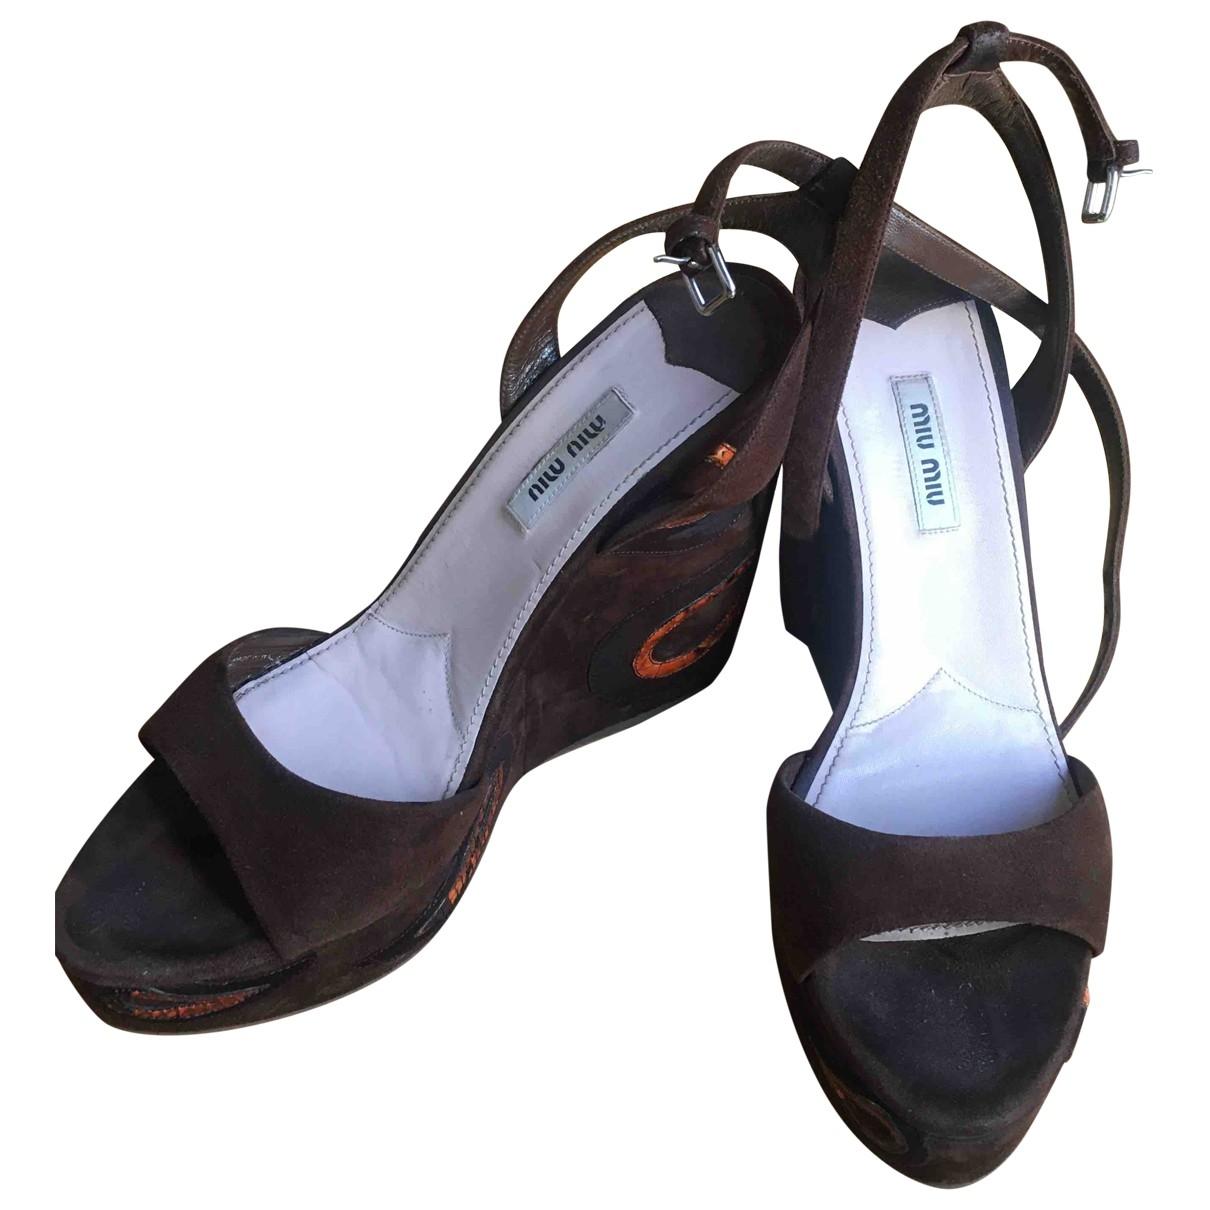 Miu Miu \N Brown Suede Sandals for Women 39 EU